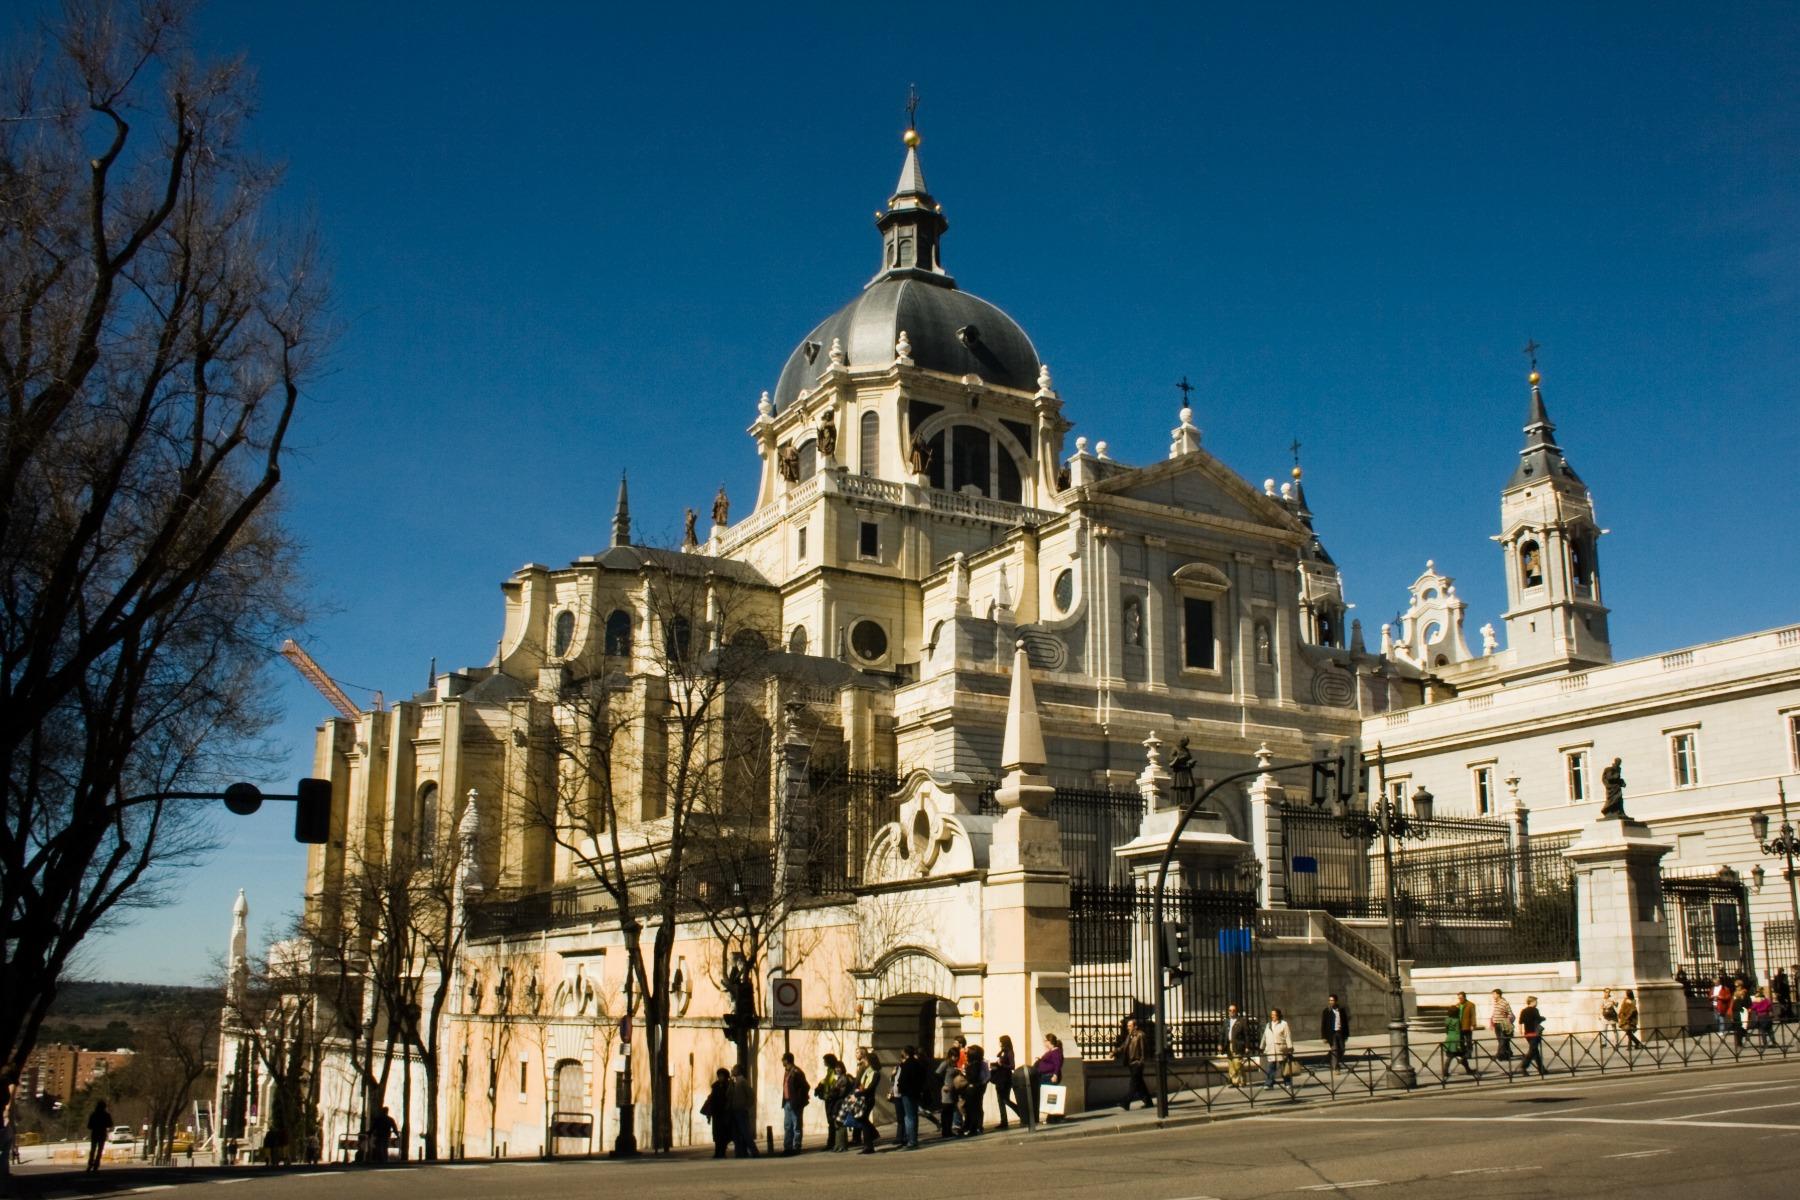 Almudena Katedrali (Kent Katedrali):